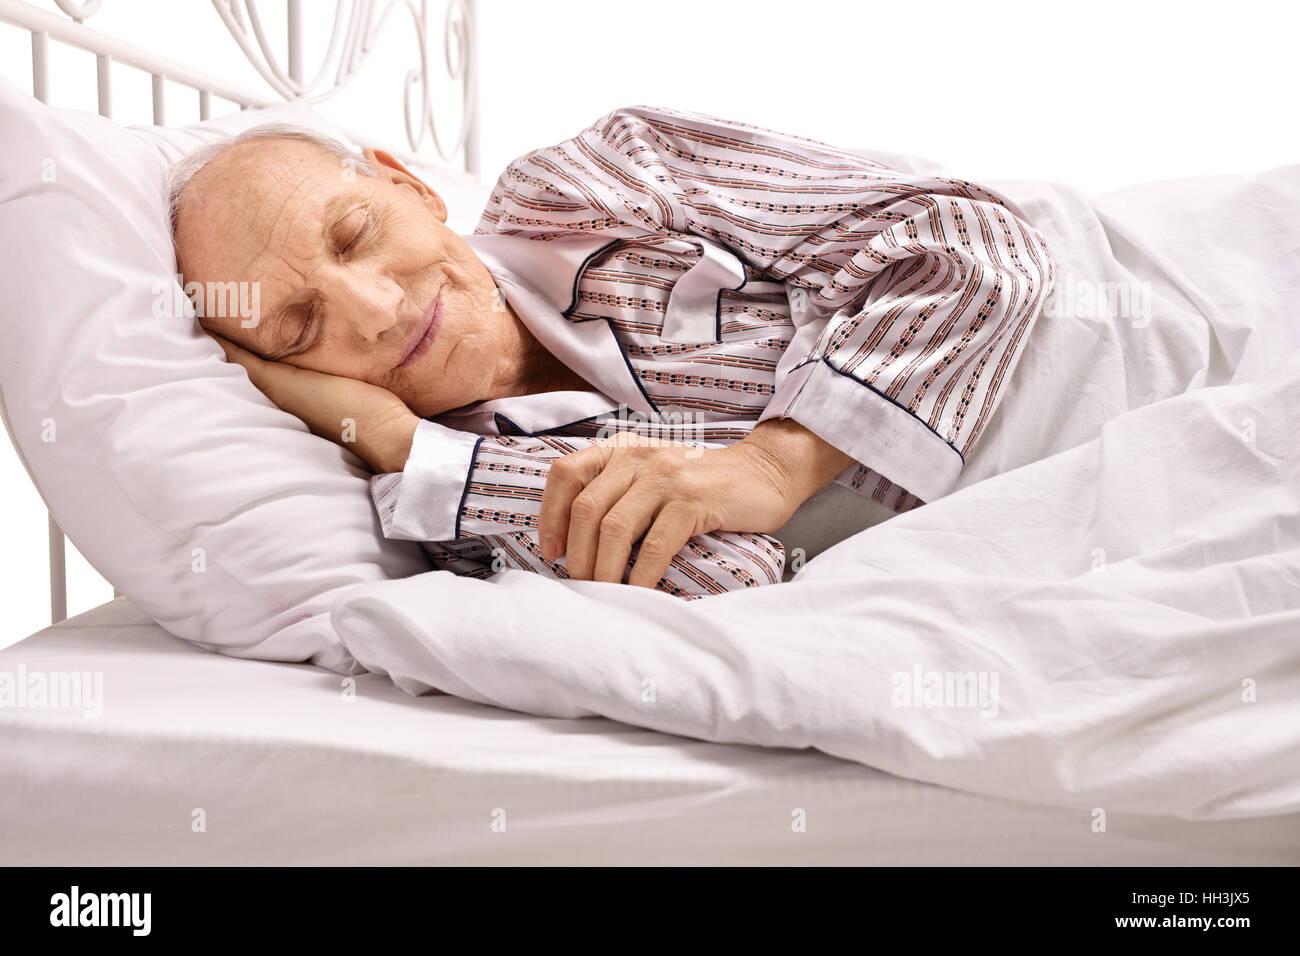 Senior sleeping in bed isolated on white background - Stock Image